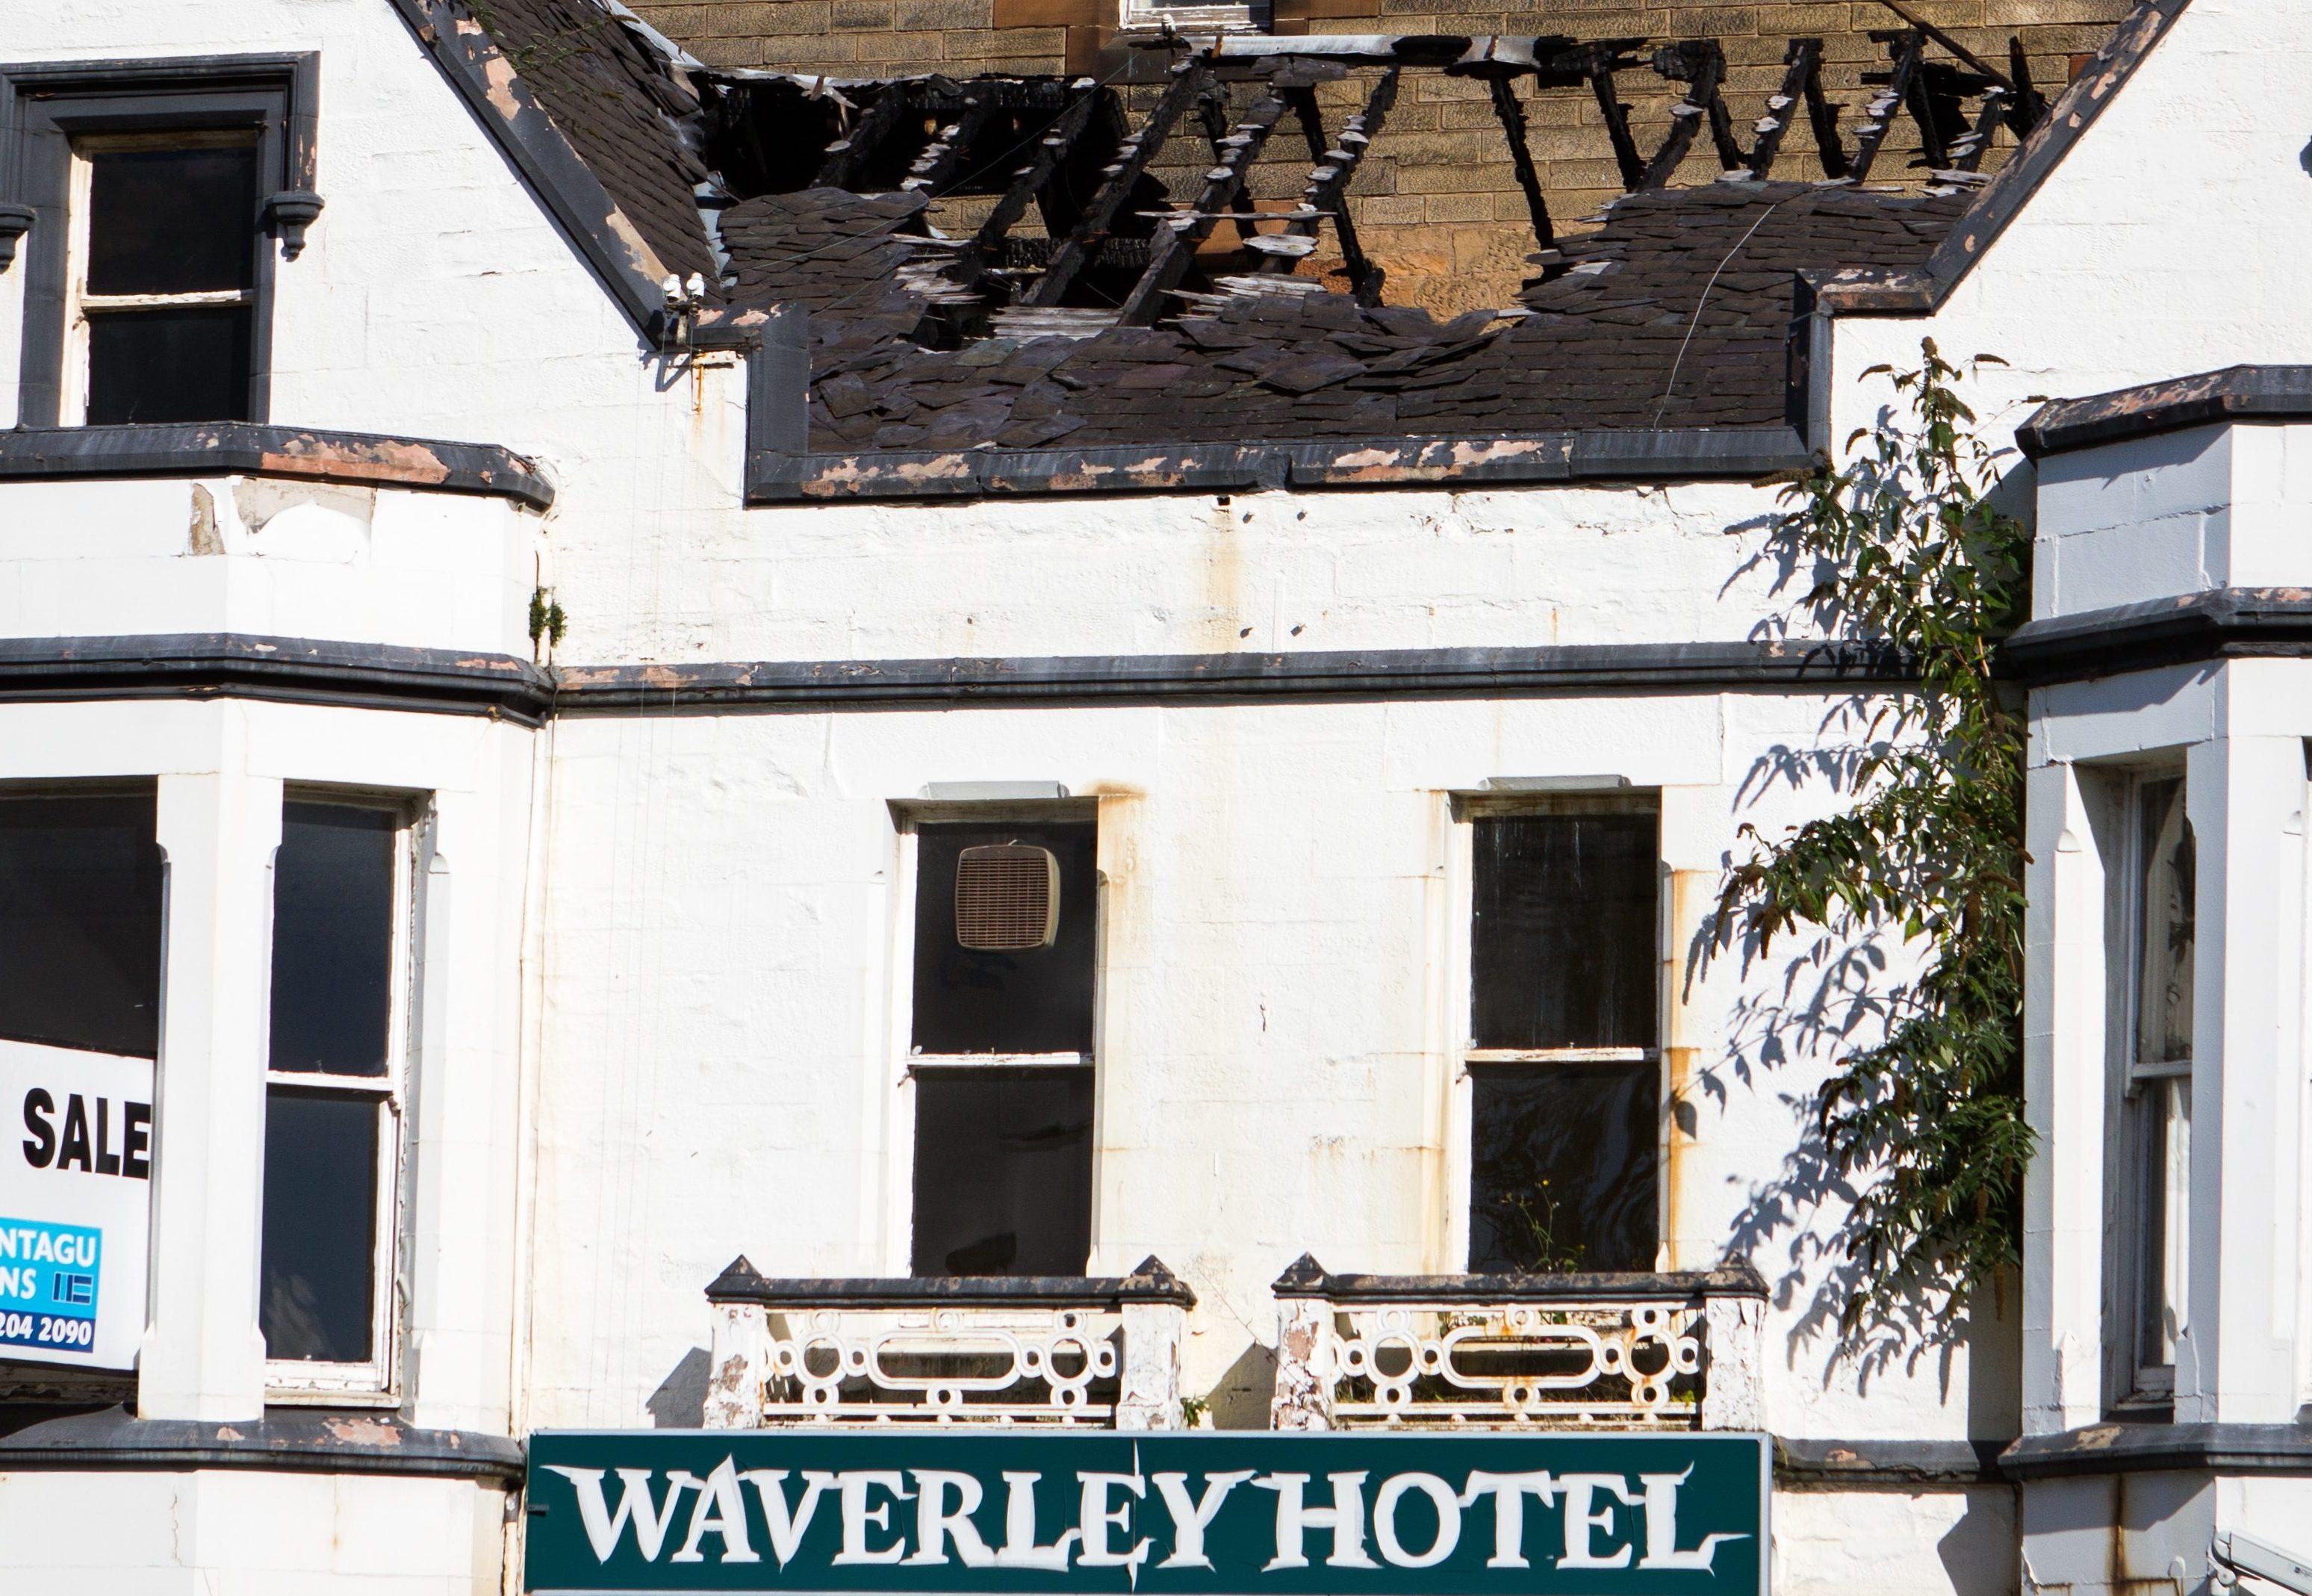 The Waverley Hotel, Perth.